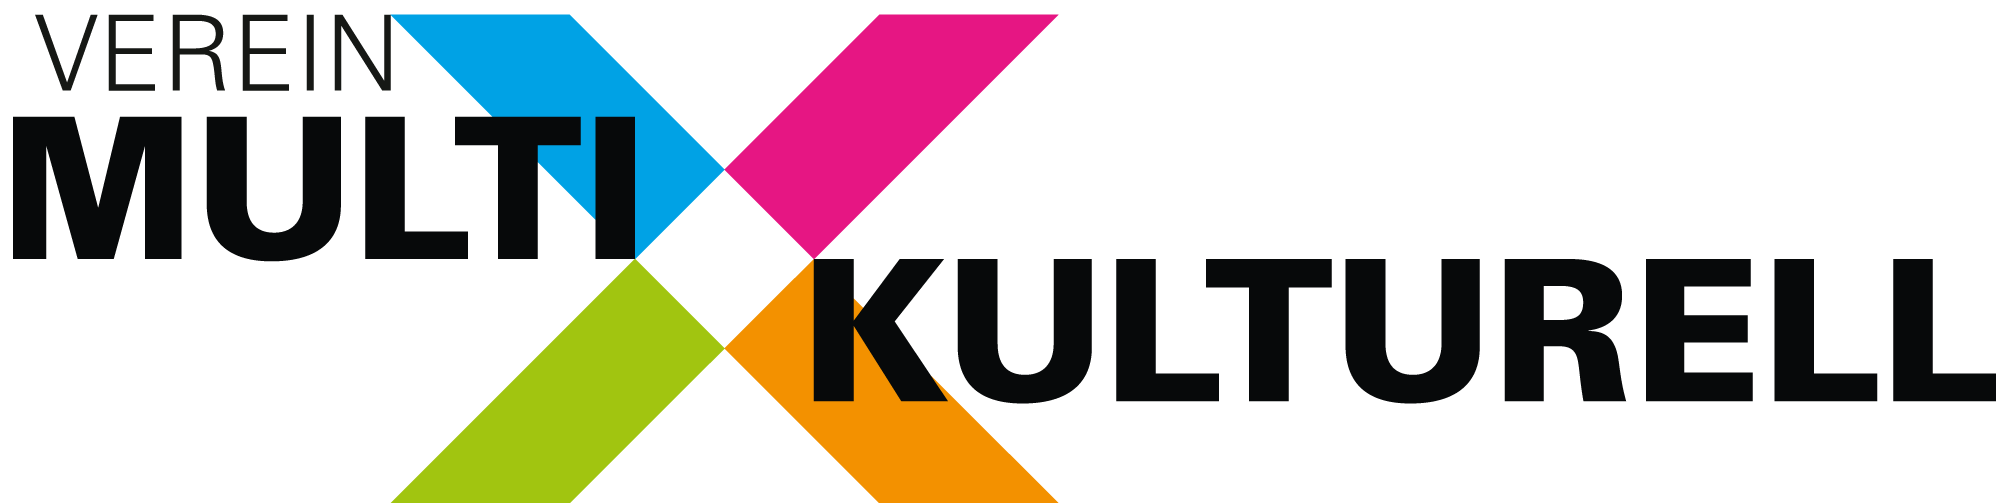 Verein Multikulturell (Austria)